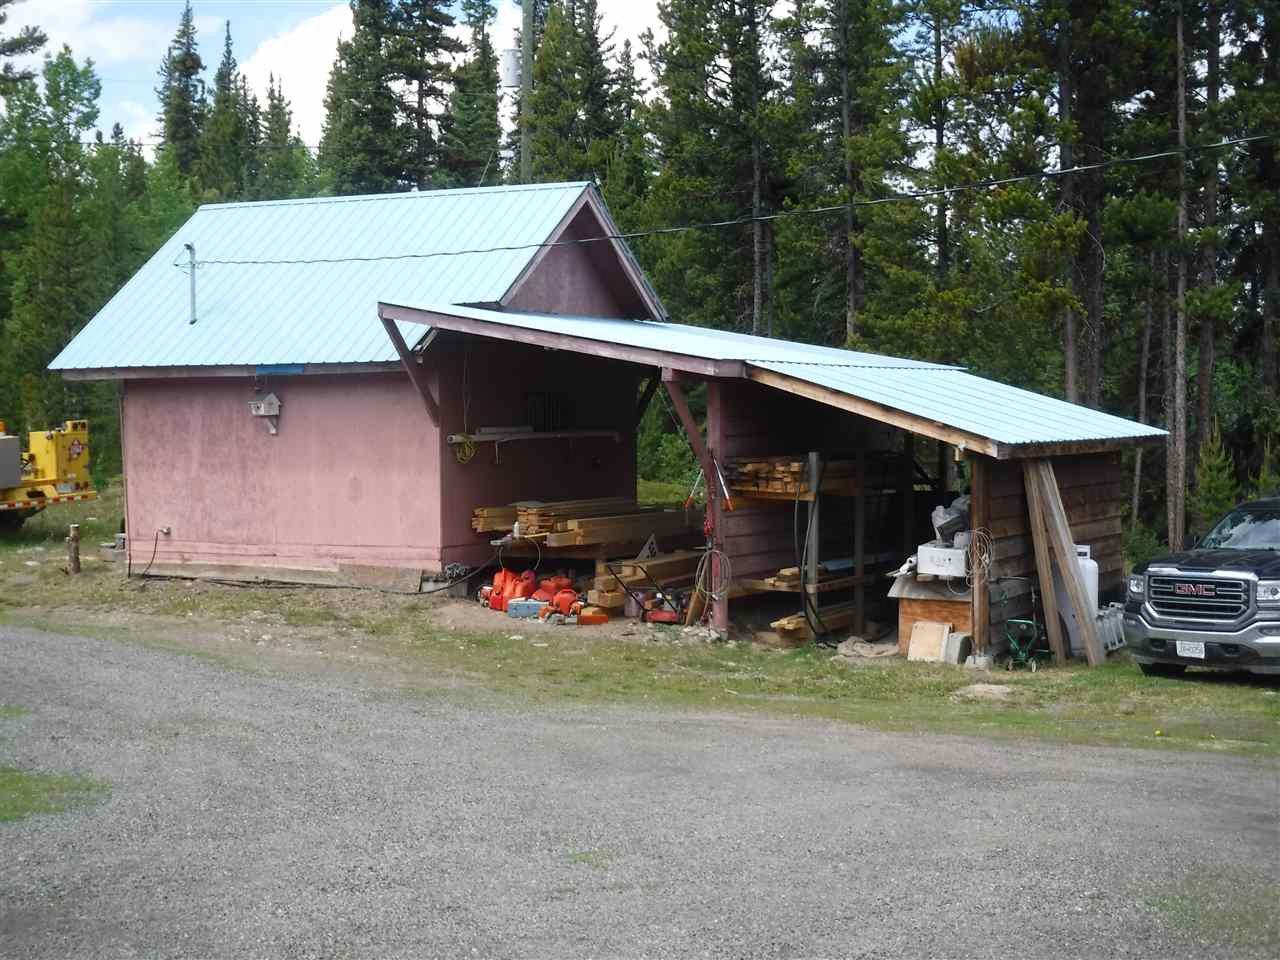 Photo 10: Photos: 3126 ELSEY Road in Williams Lake: Williams Lake - Rural West House for sale (Williams Lake (Zone 27))  : MLS®# R2467730